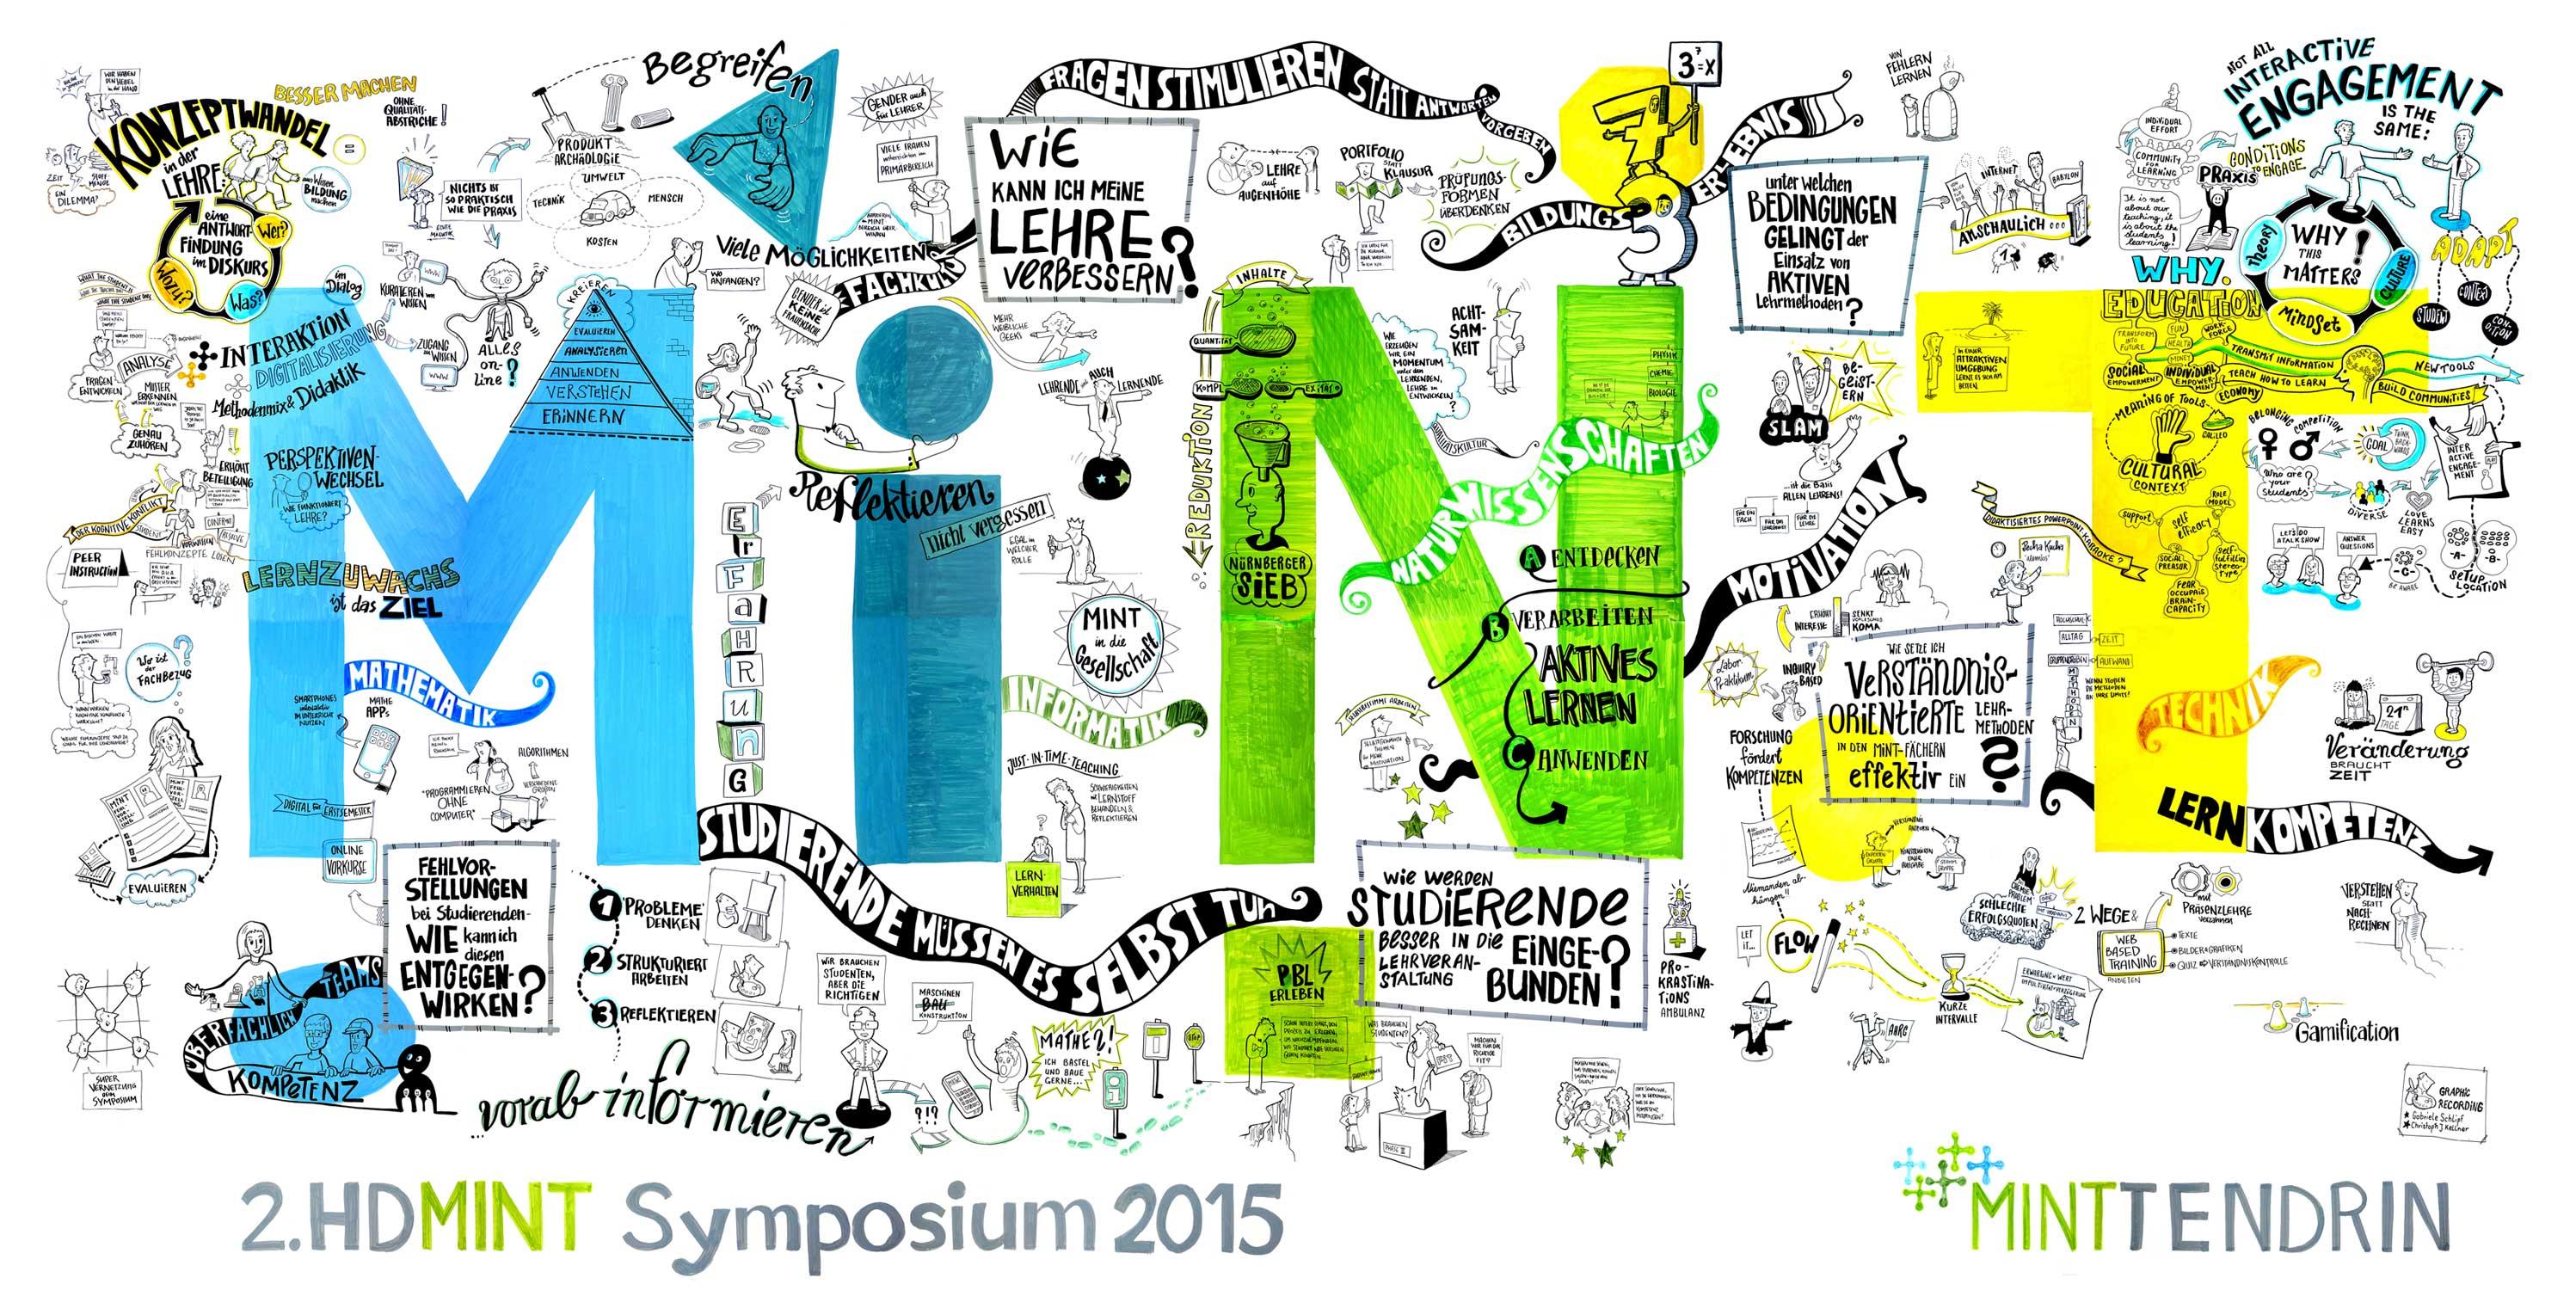 Grafic Recording HD MINT Symposium